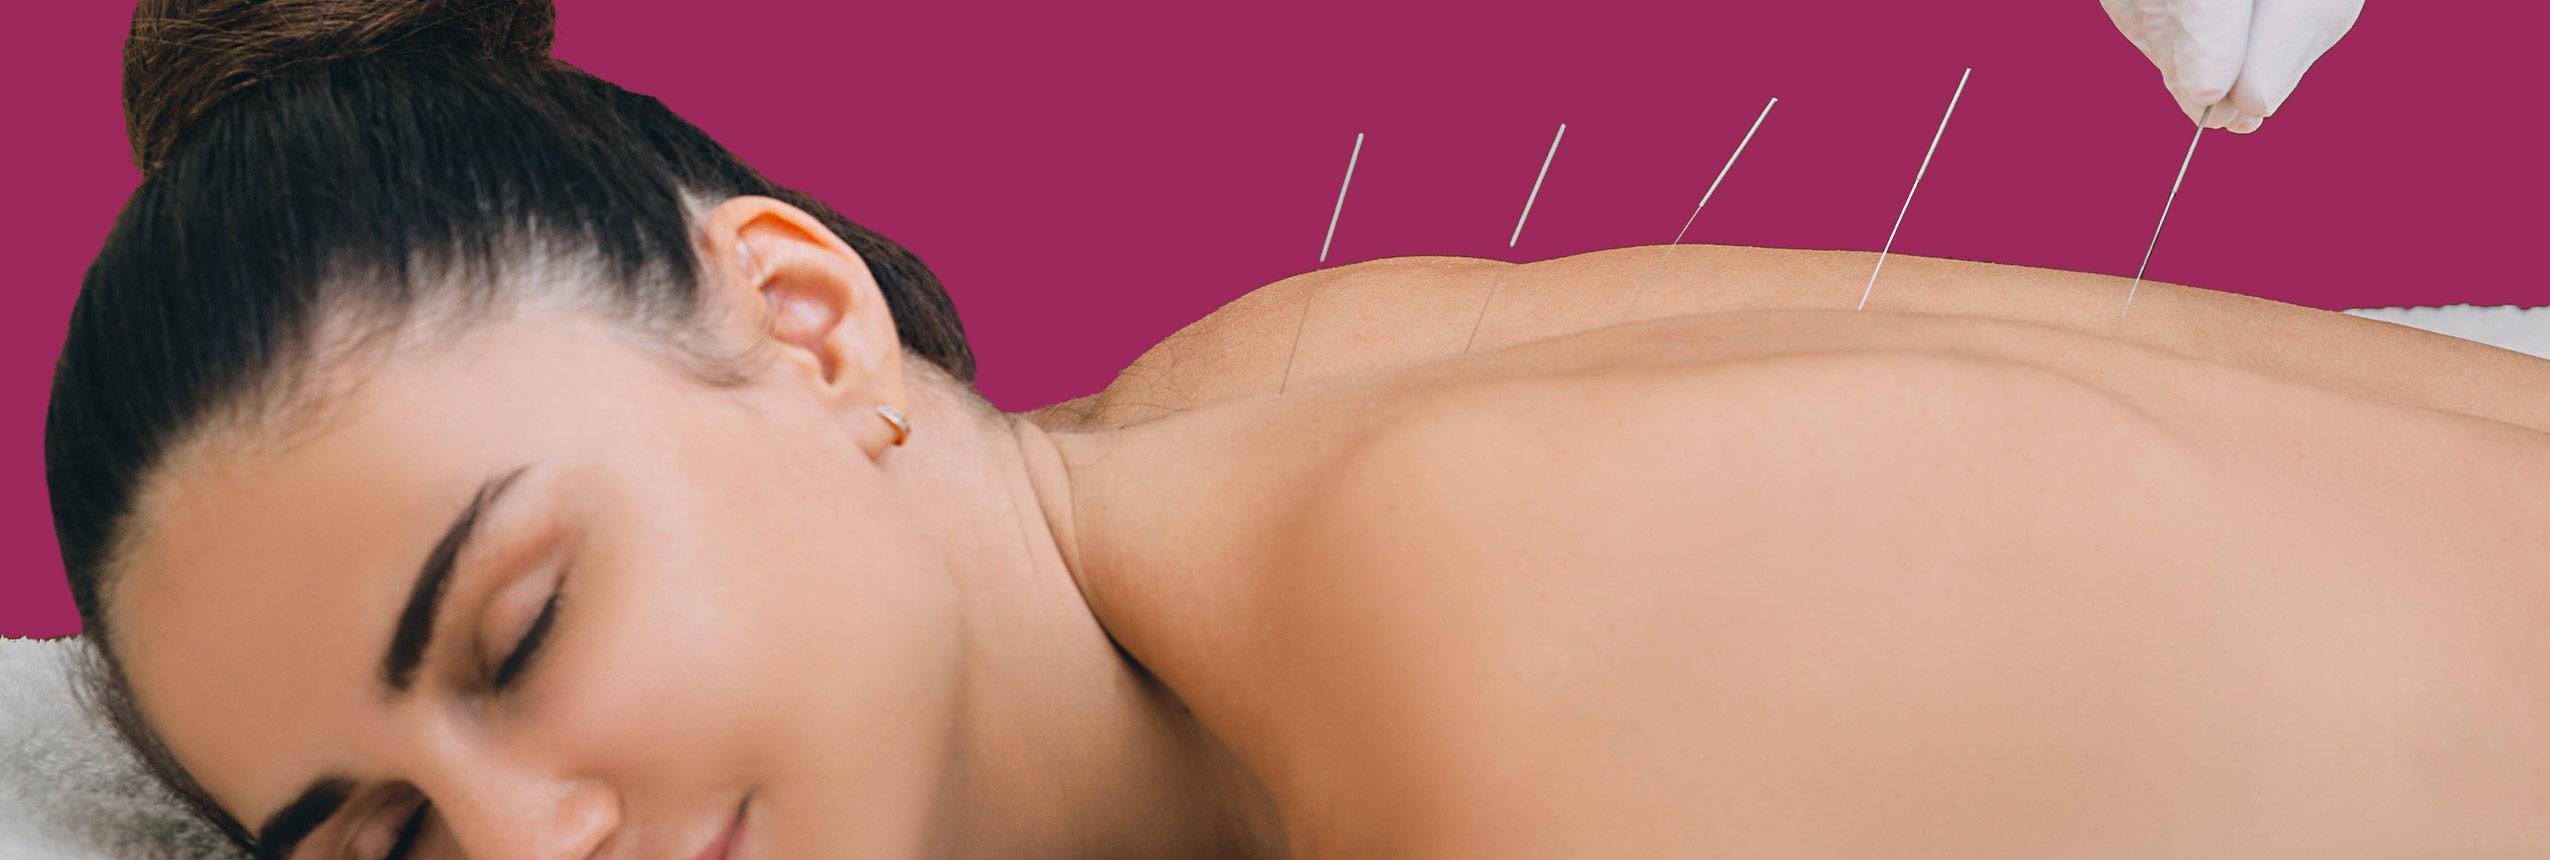 akupuntur muenchen orthopaede - Akupunktur